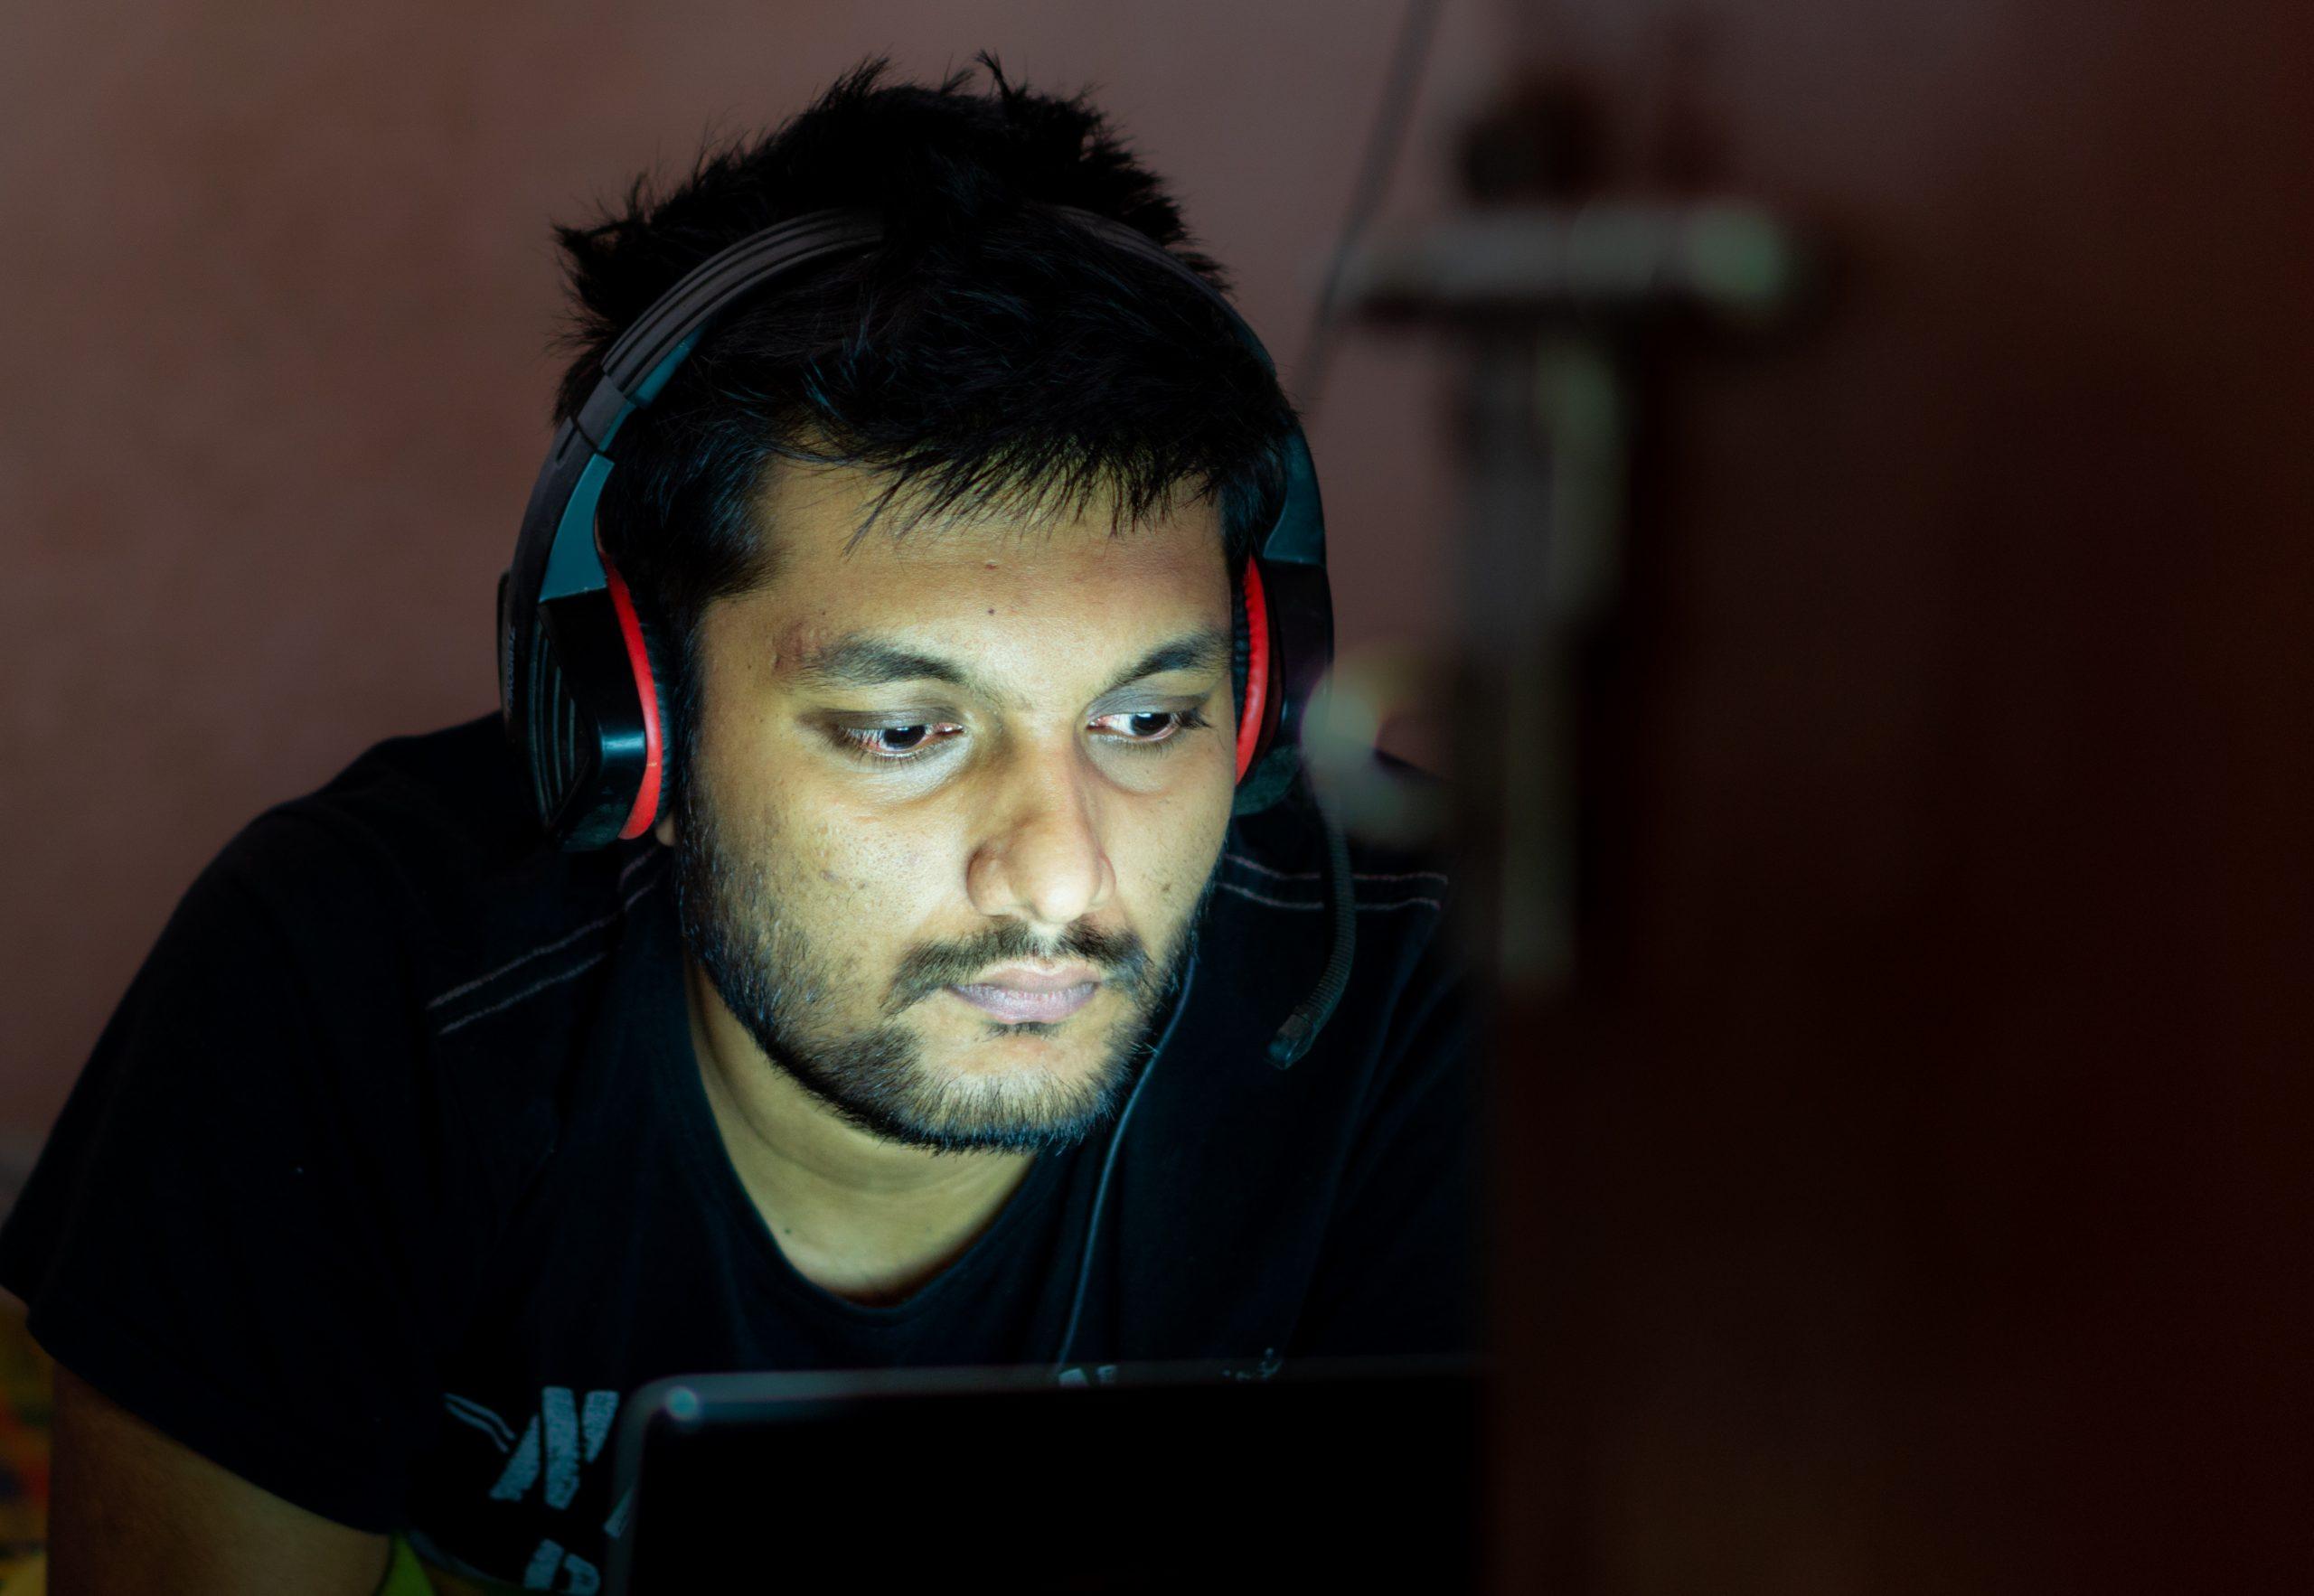 Man working late night on laptop